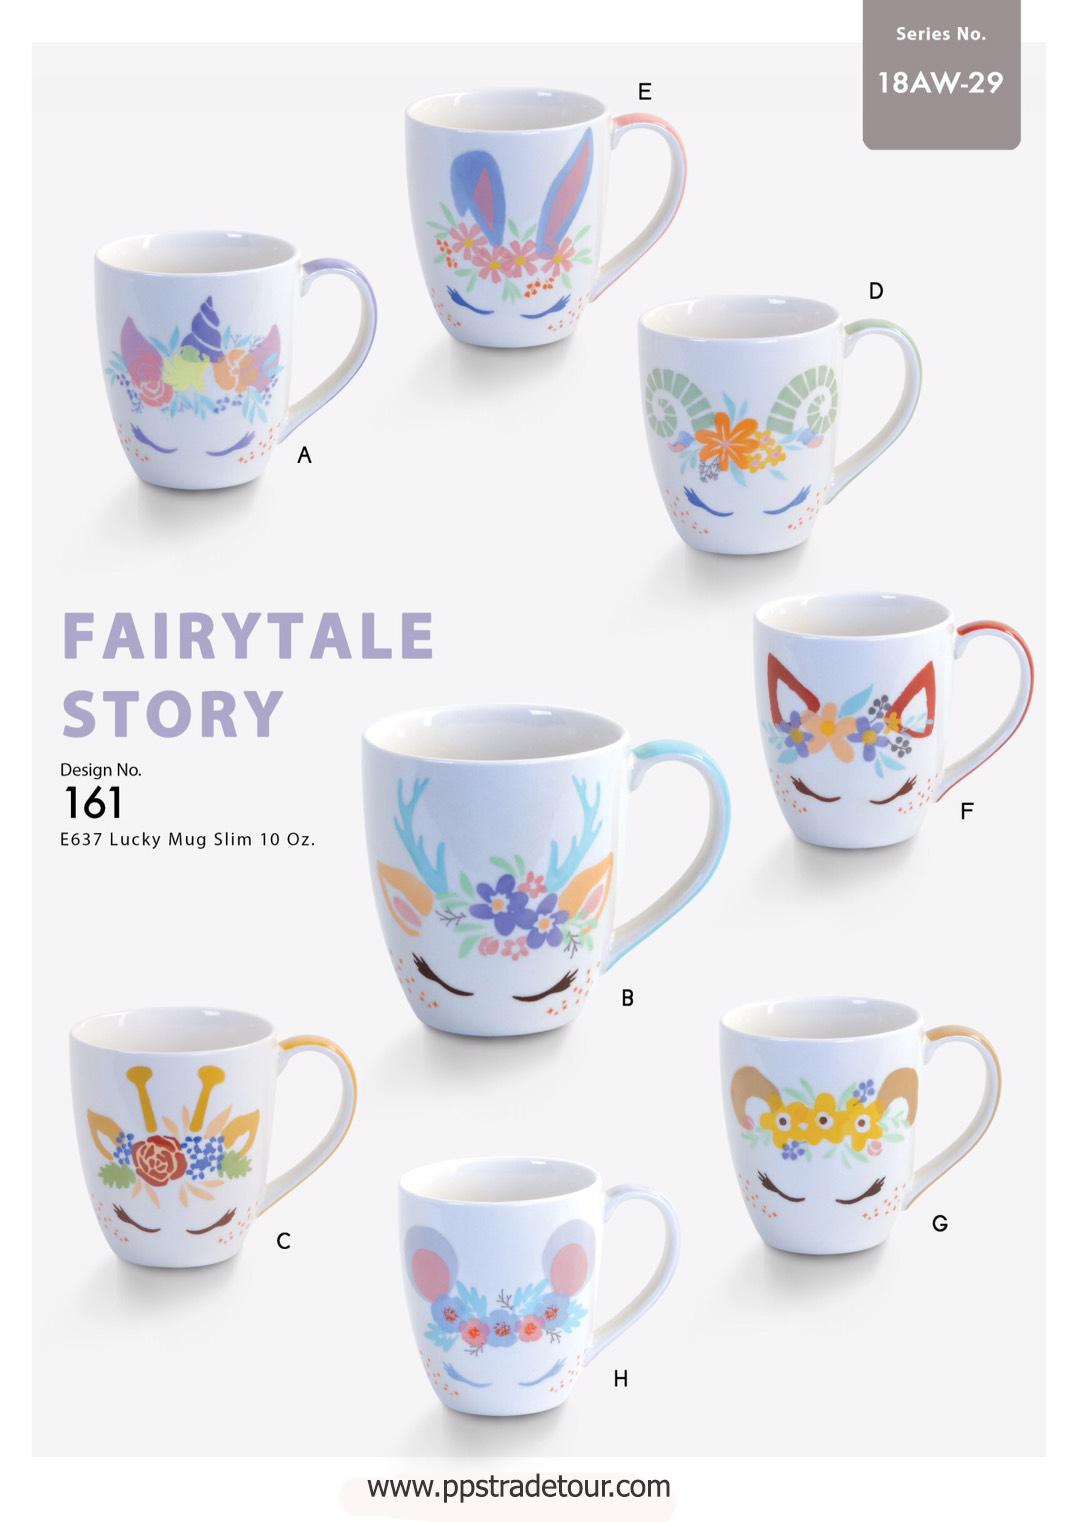 Fairytale Story-Ceramic Mug 10 Oz.